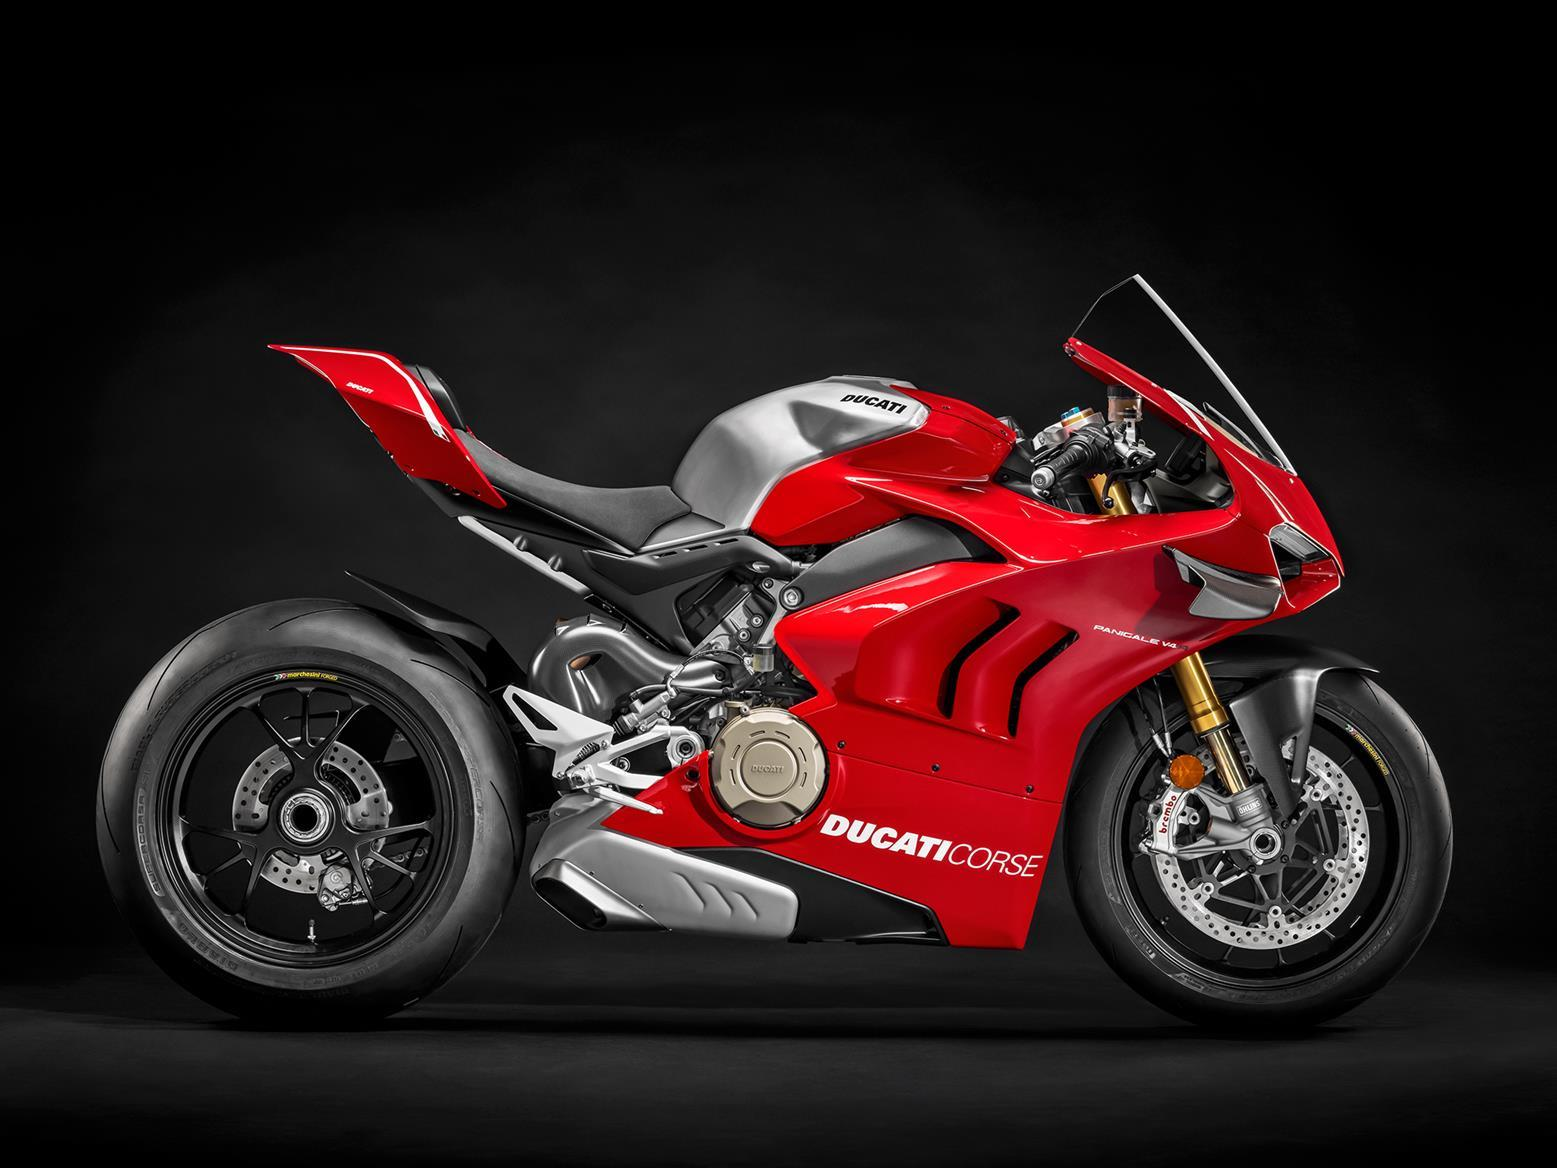 Ducati Panigale V4 R standard bike